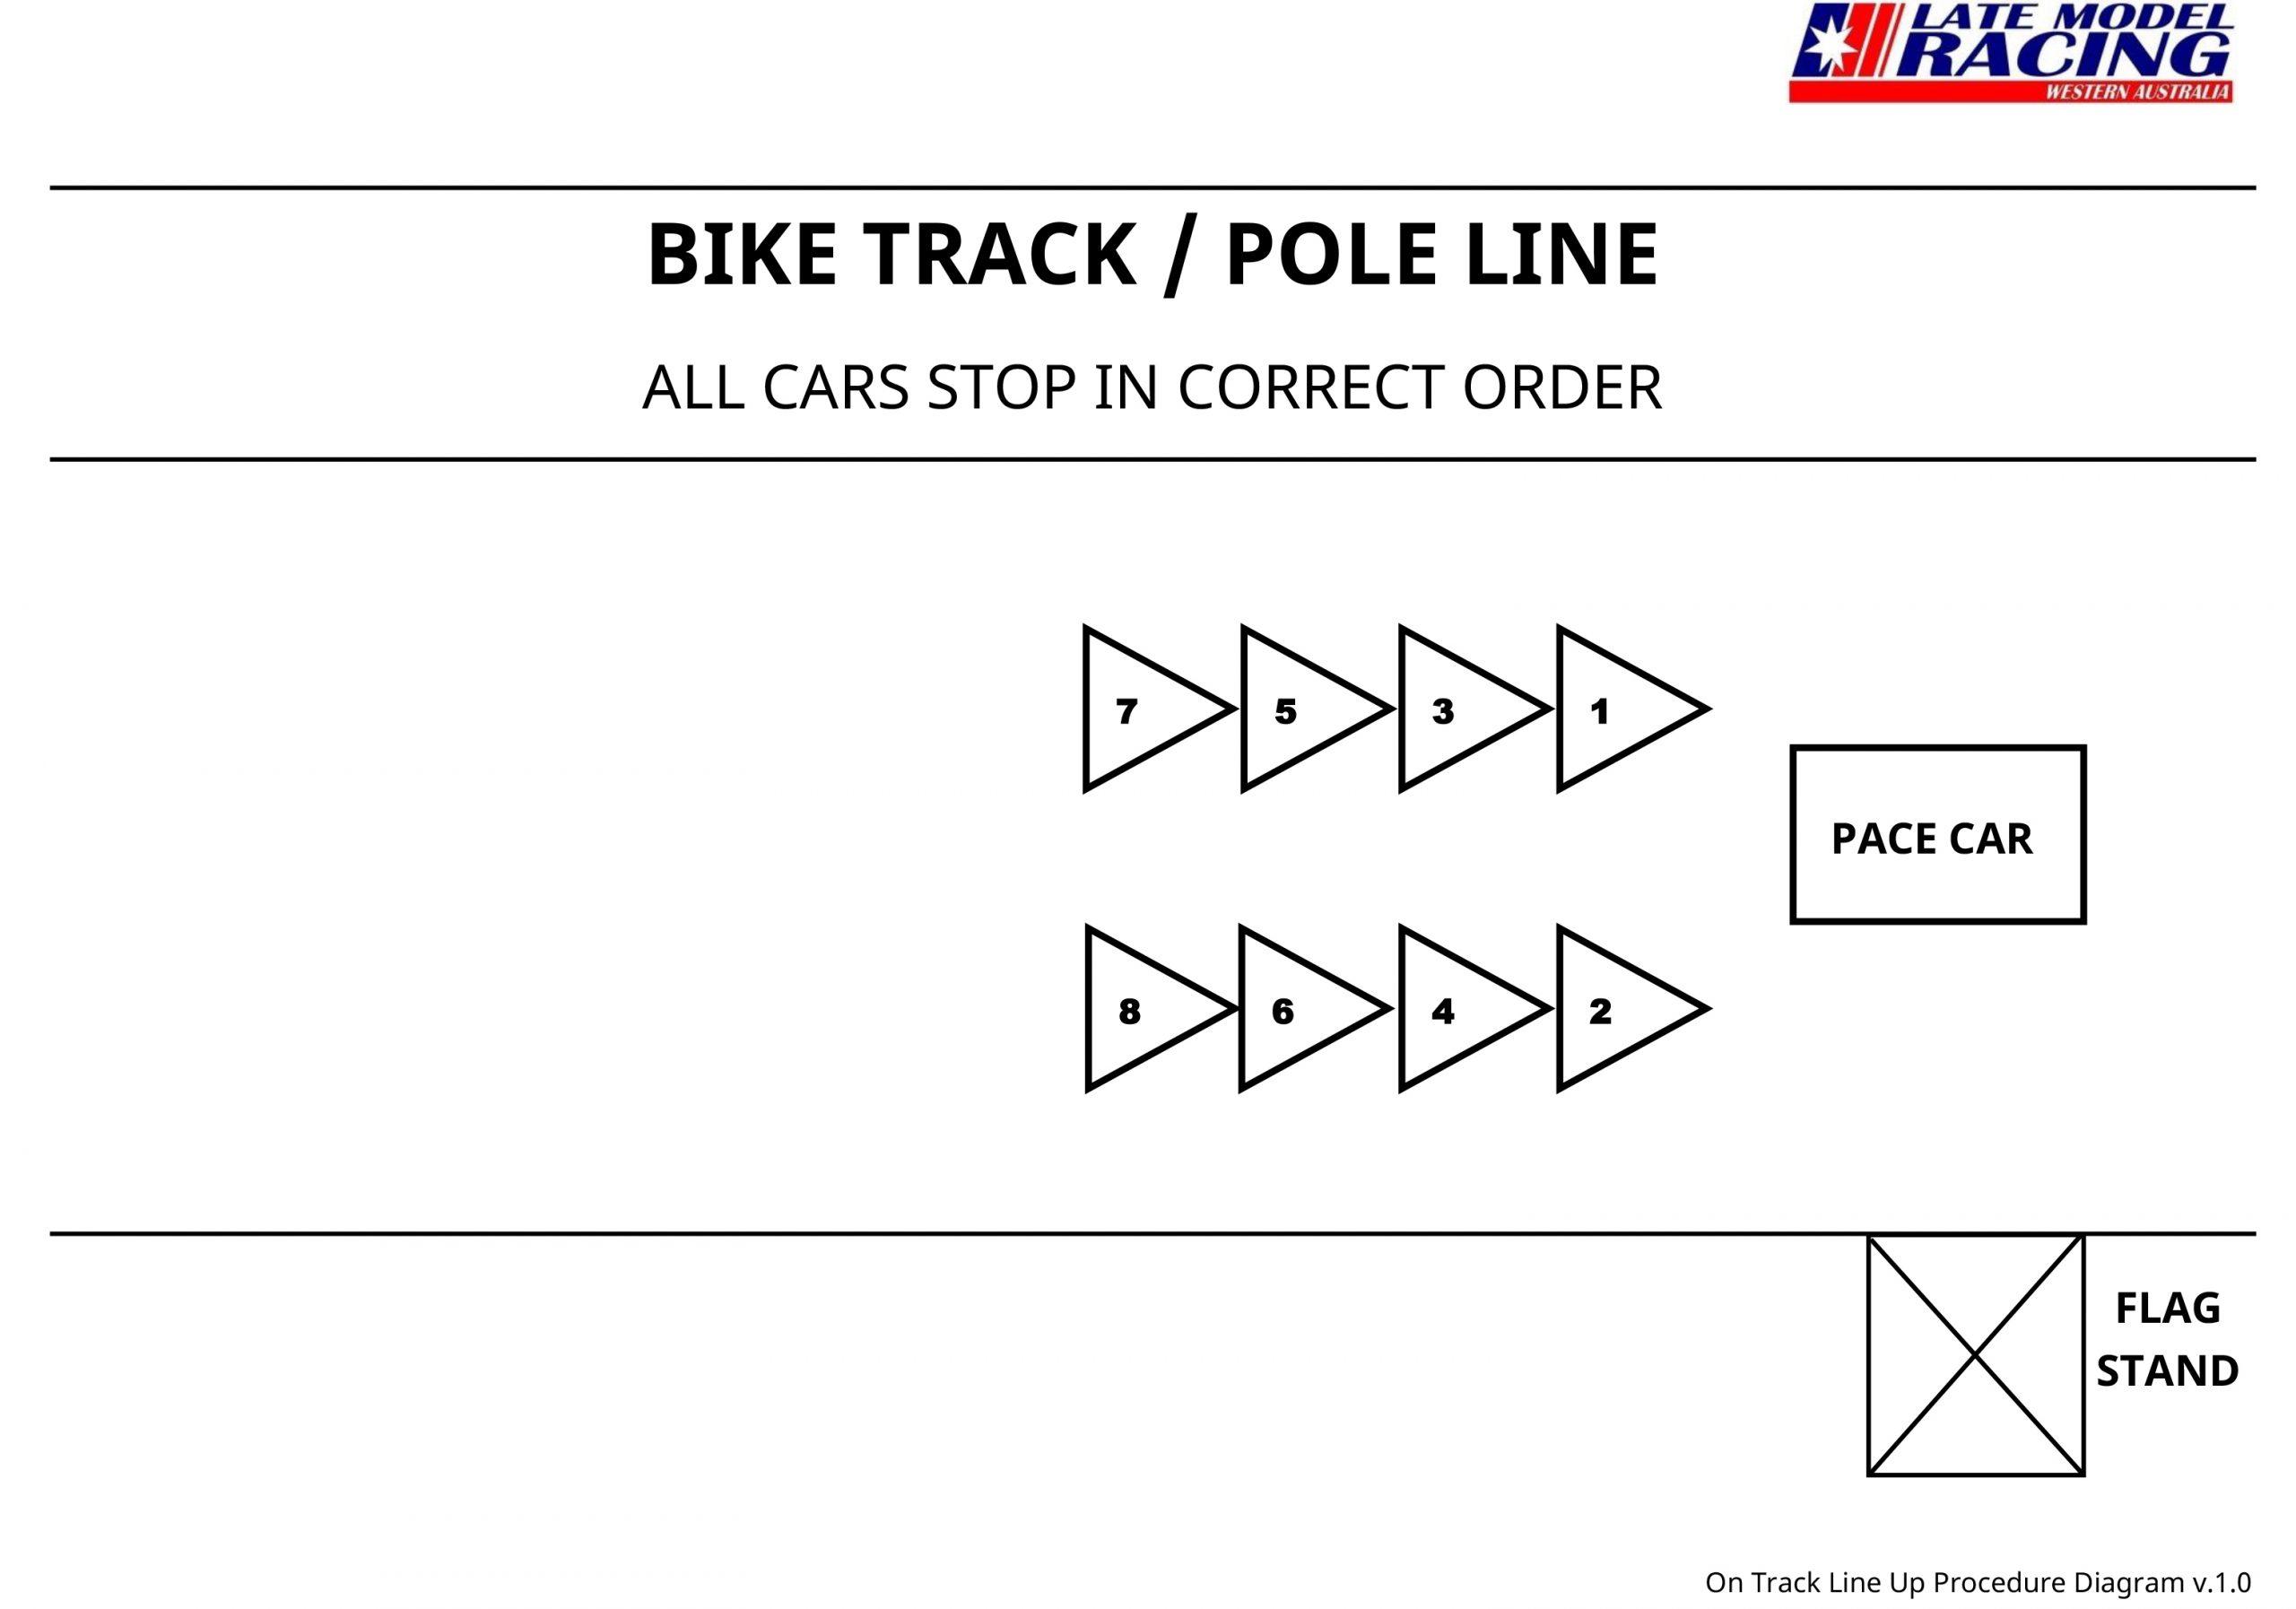 On Track Line Up Procedure Diagram